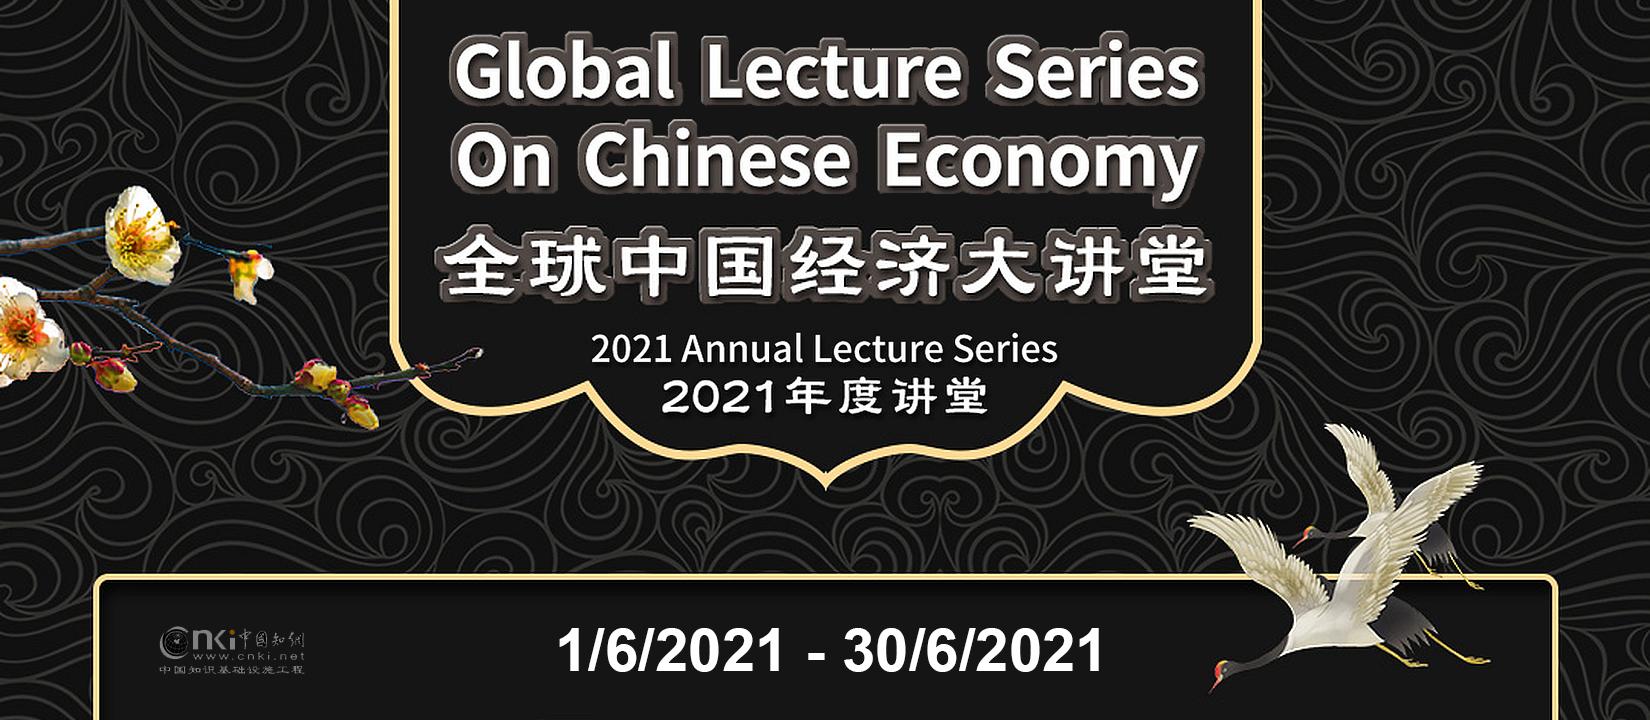 CNKI Global Lecture Series on Chinese Economy 2021 中國知網全球中國經濟大講堂2021